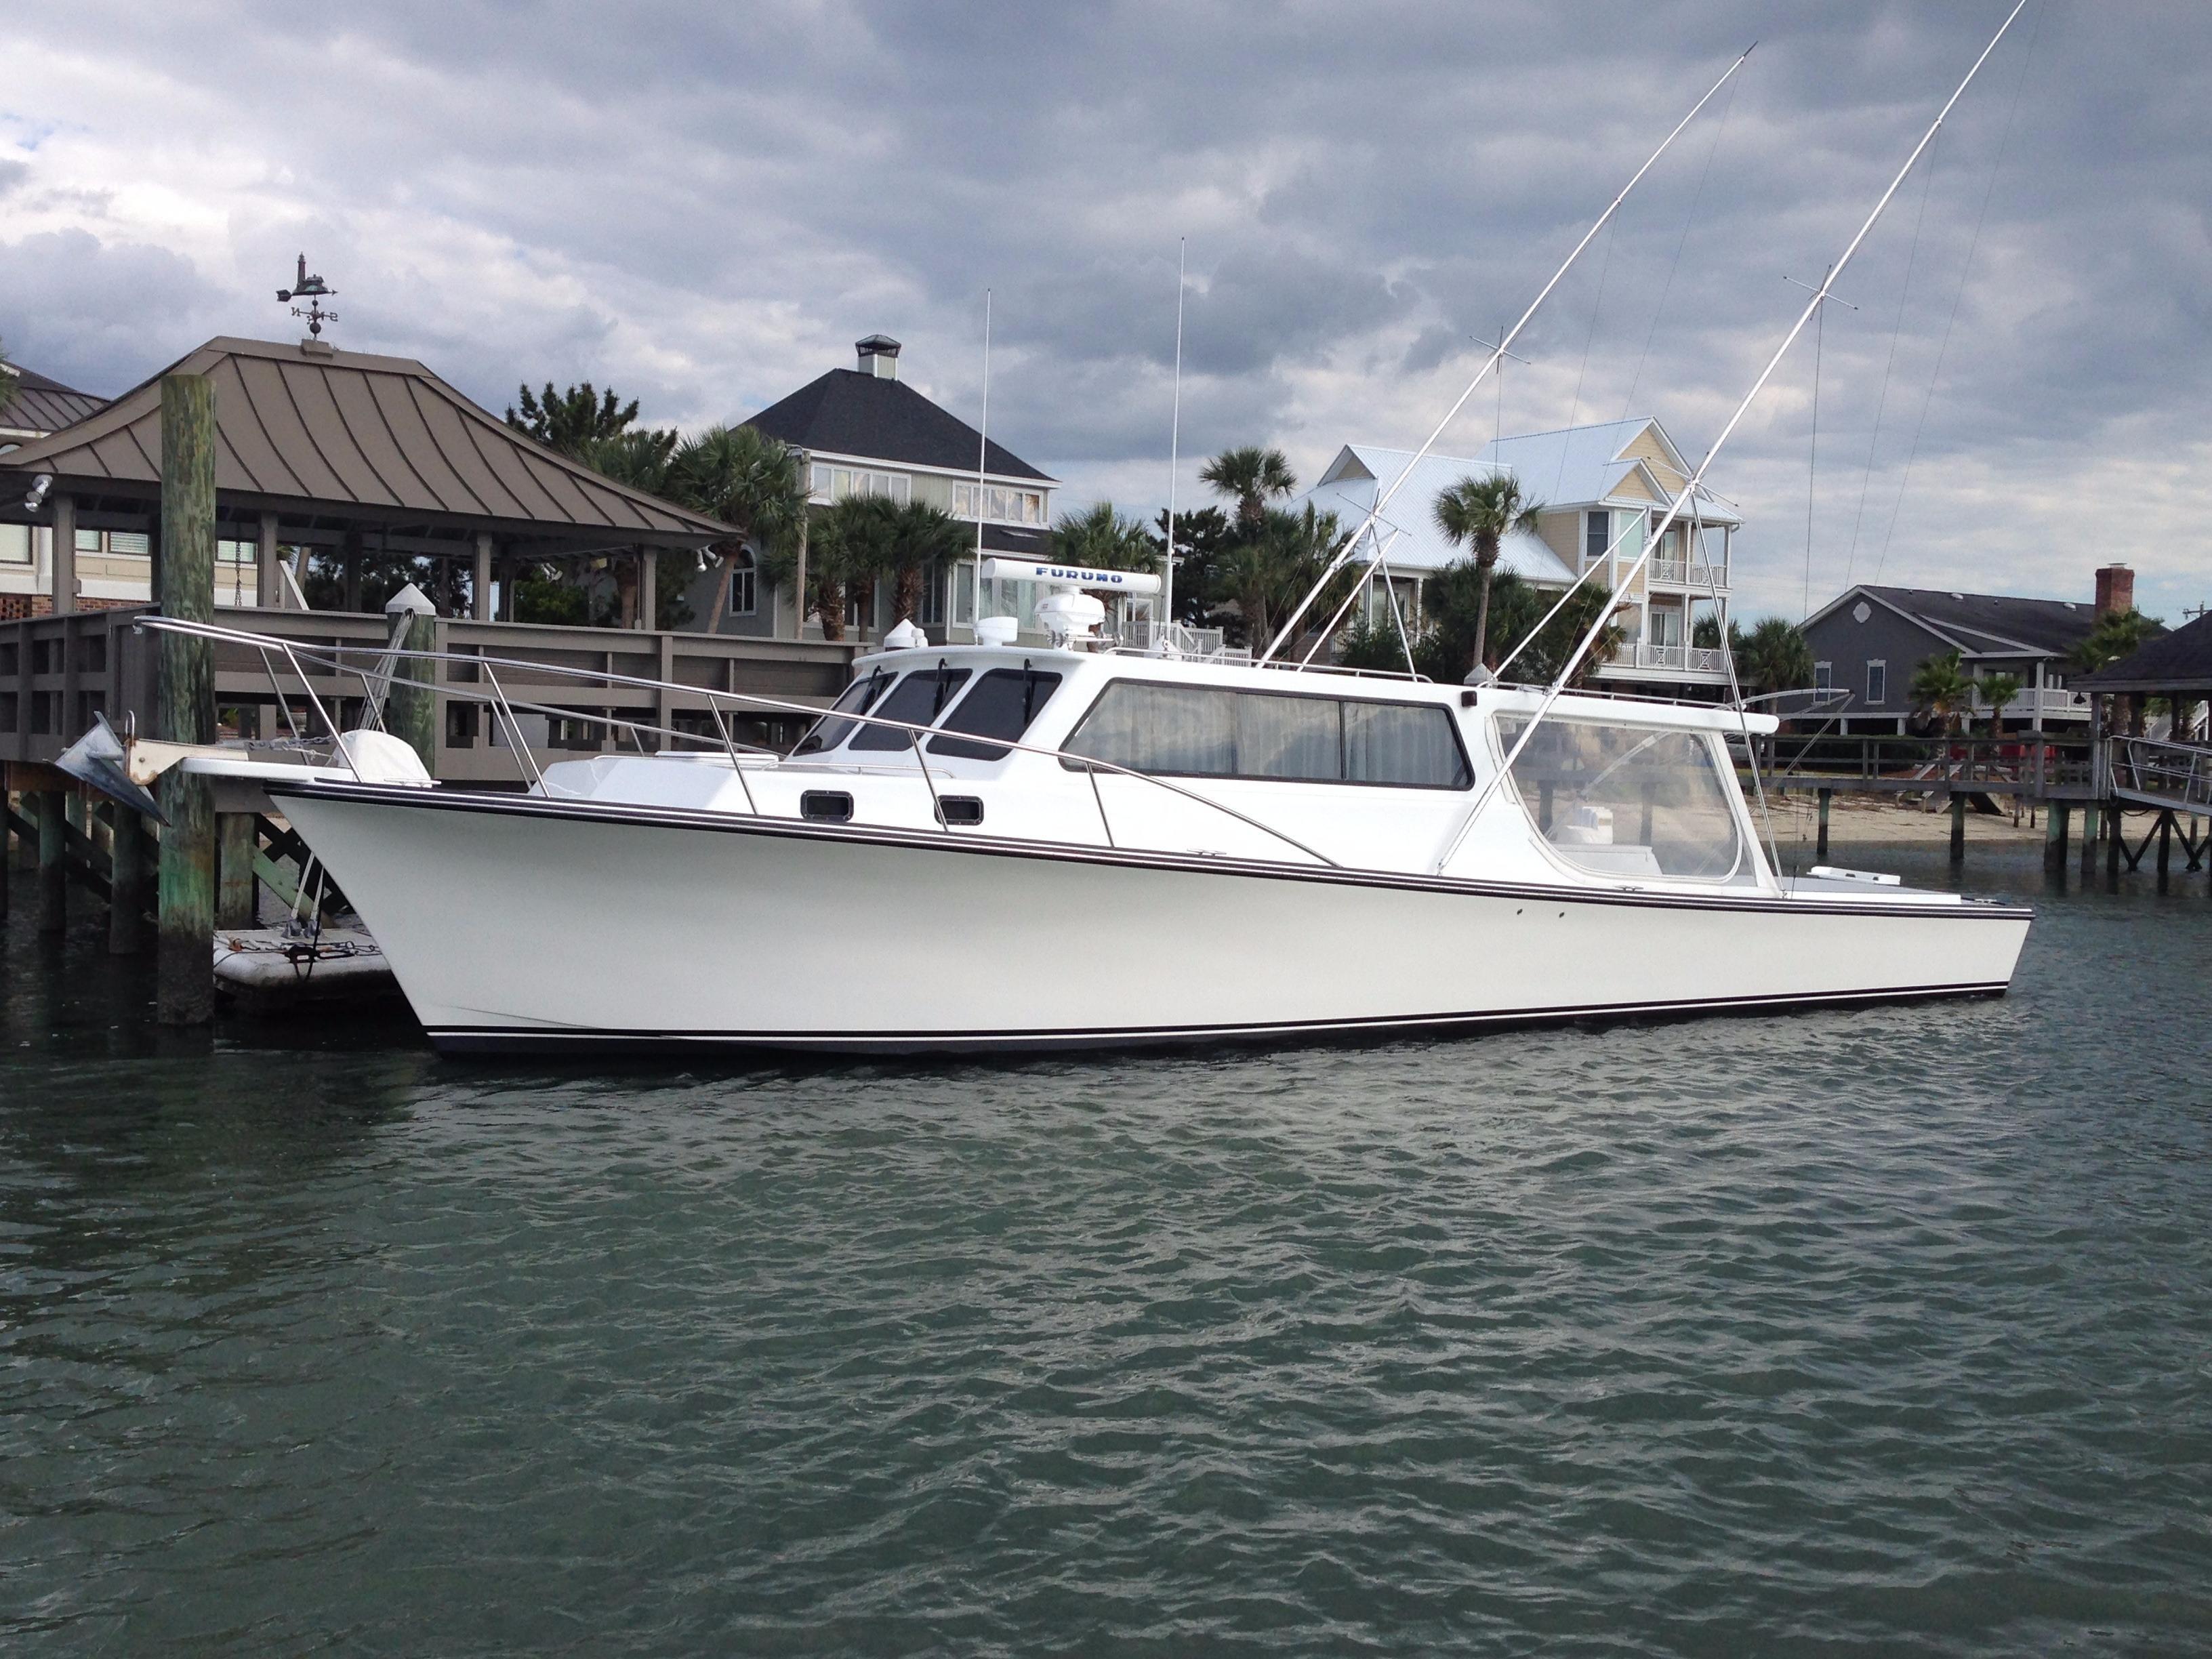 Myrtle Beach Sc Boat Show